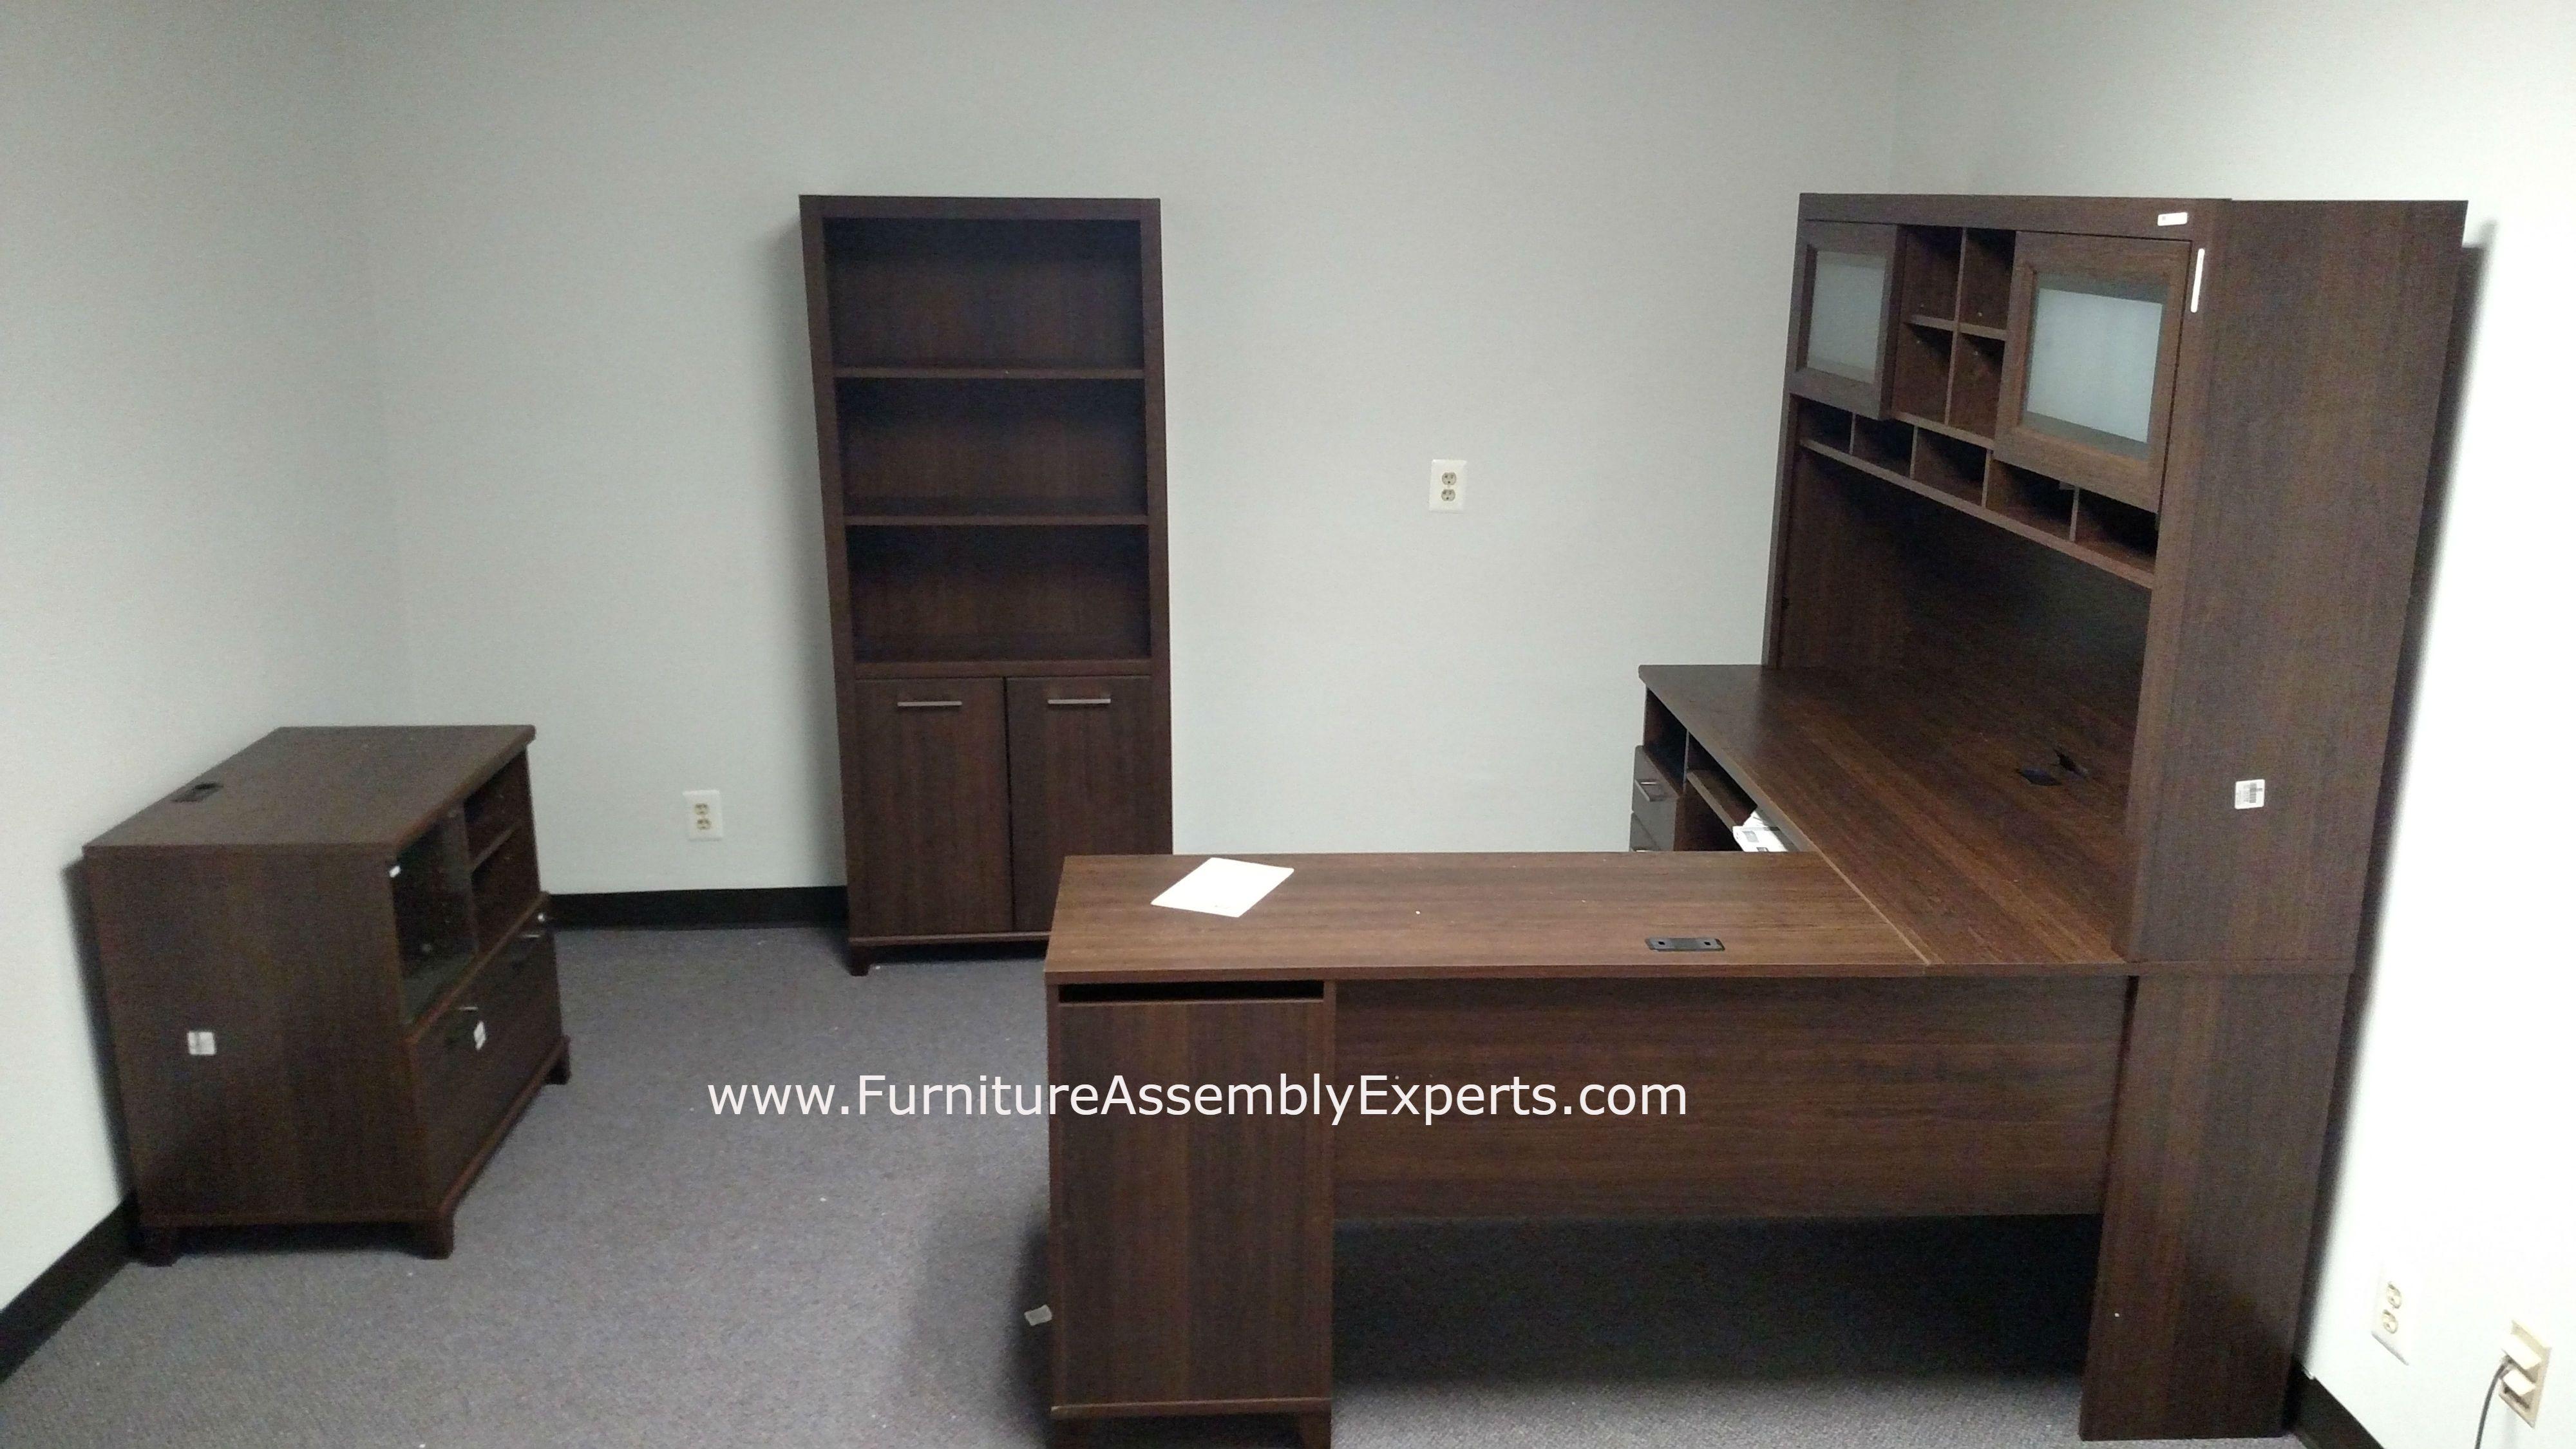 Pin On Furniture Assembly Experts Richmond Va Office Furniture Assembly Service Contractor